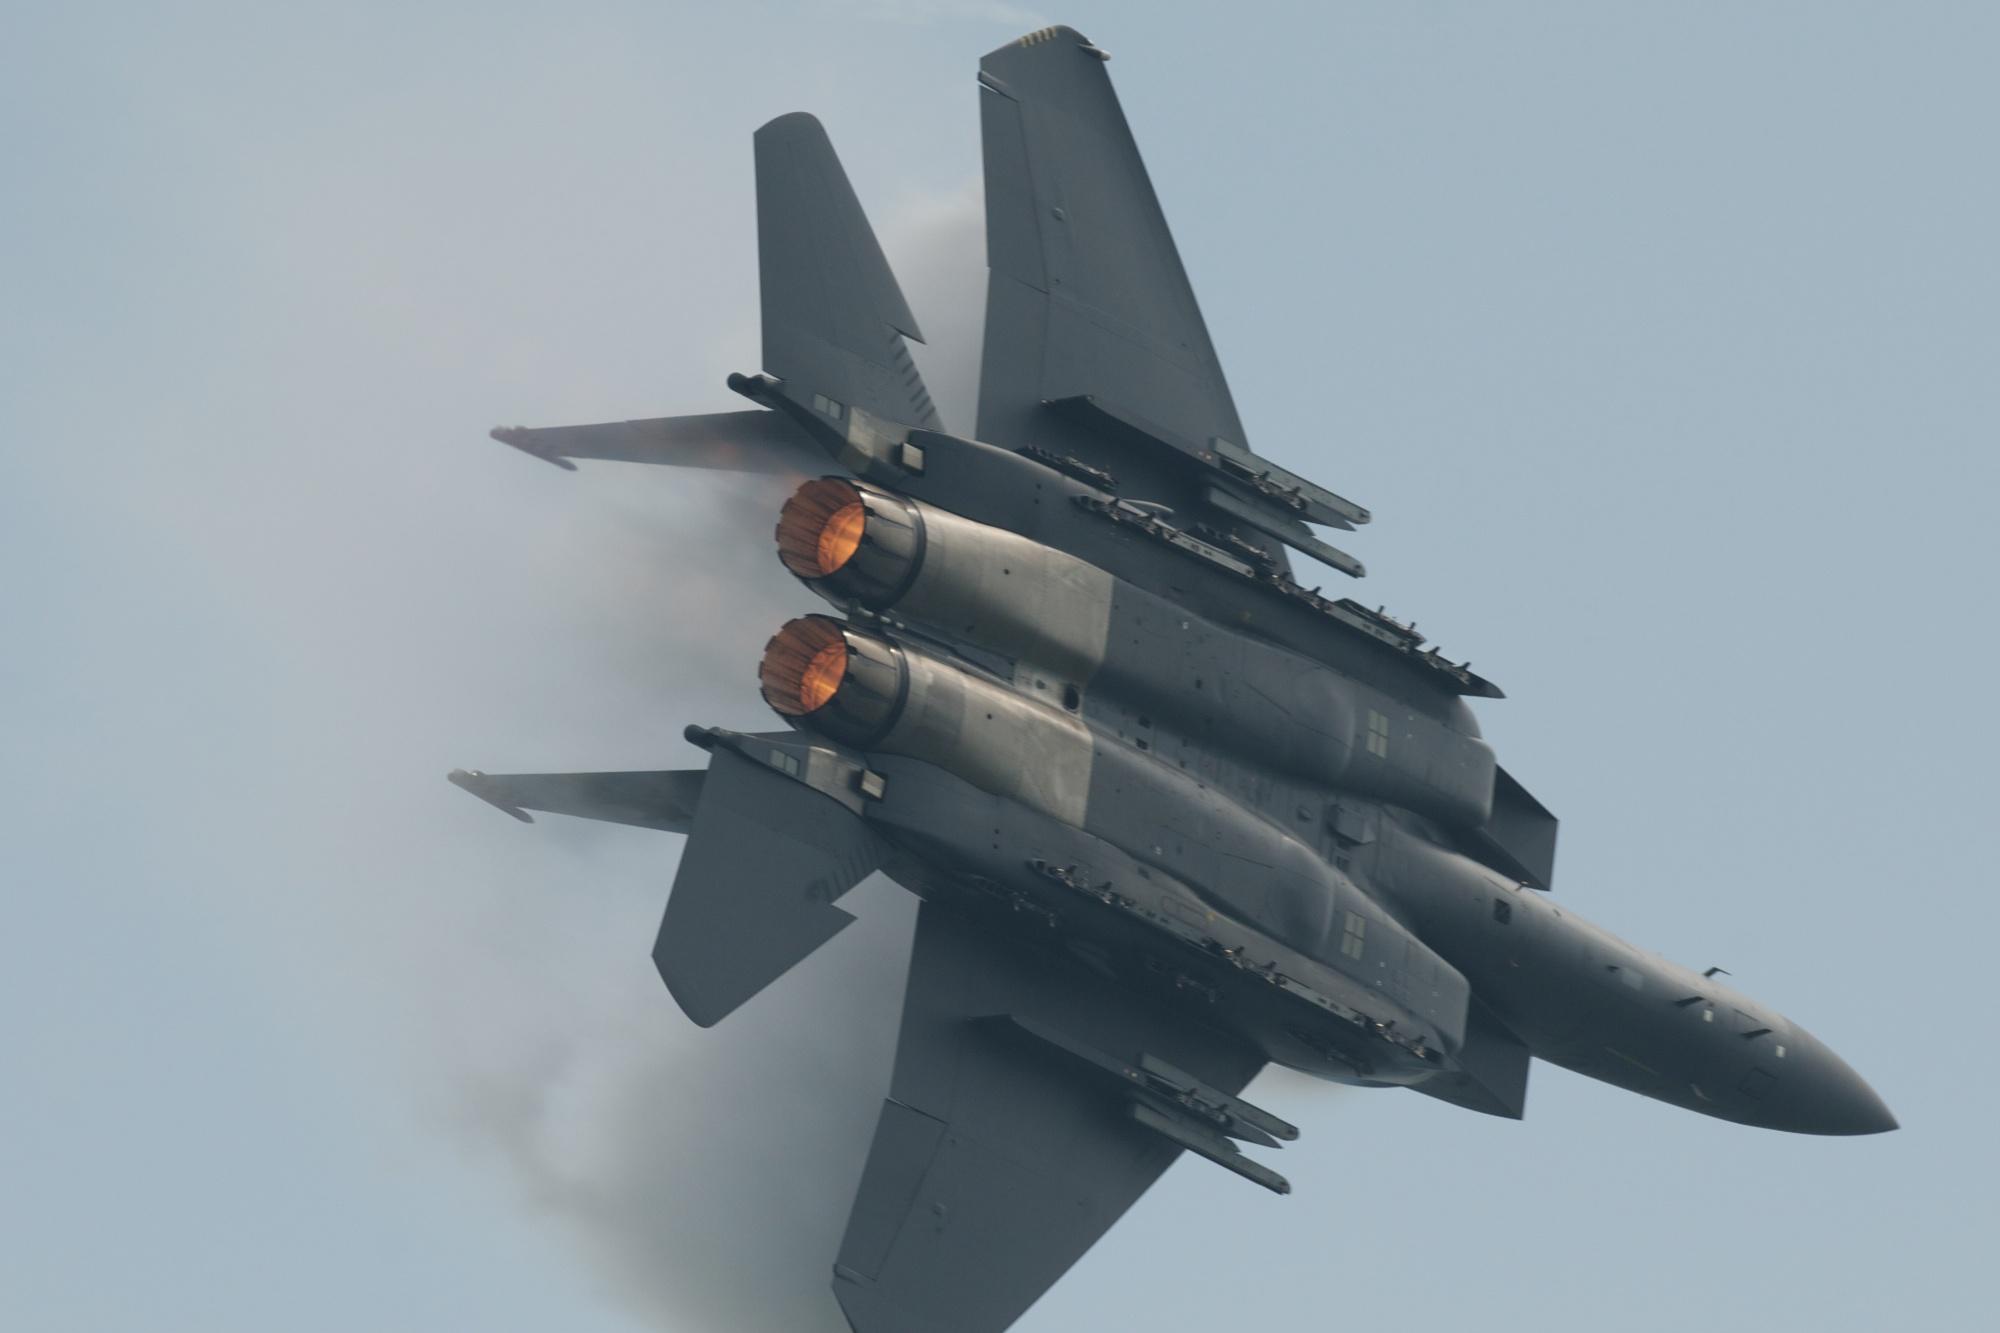 F 15 Singapura File:RSAF McDonnell Do...